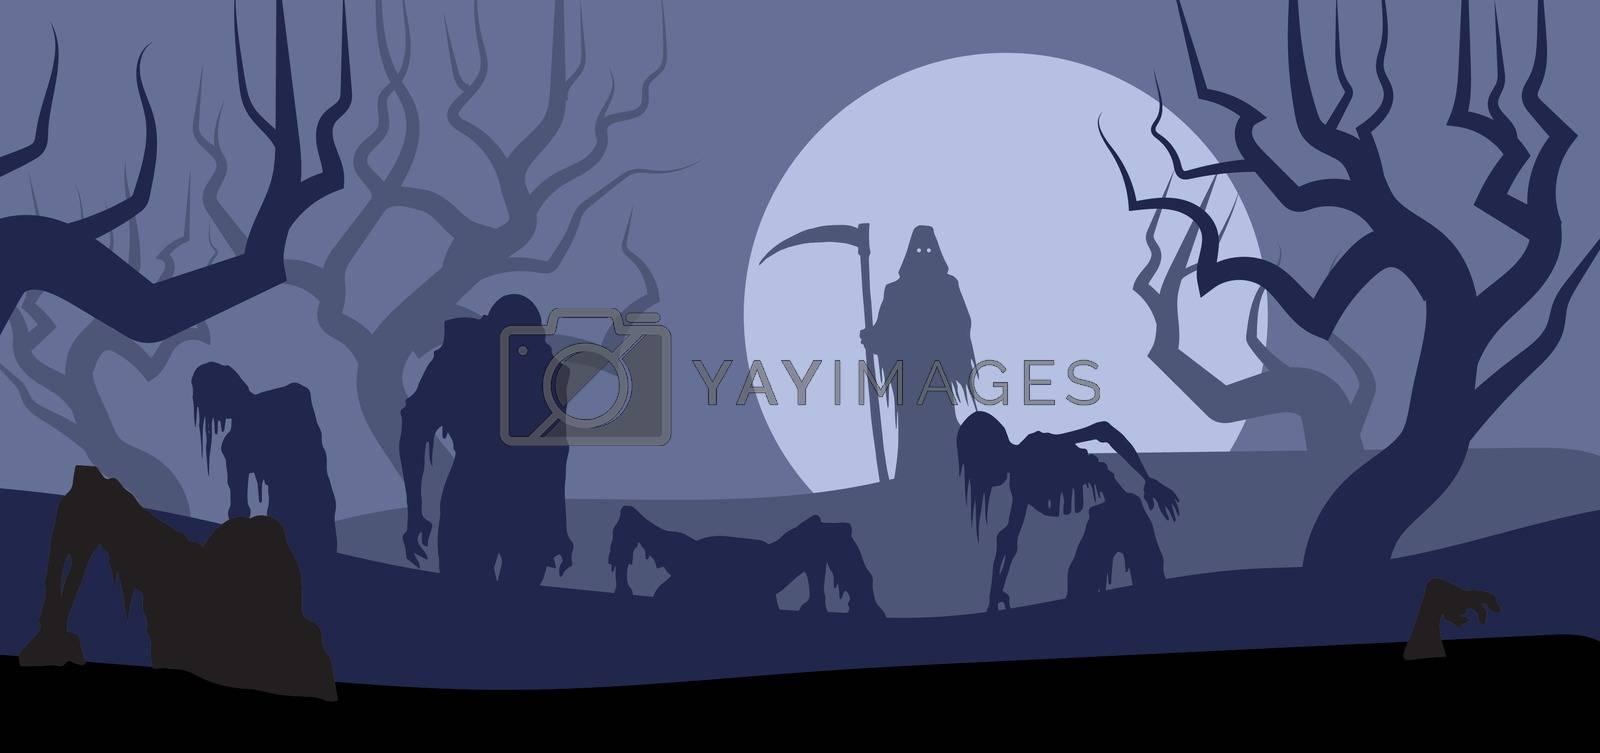 Grim reaper rises zombies for halloween